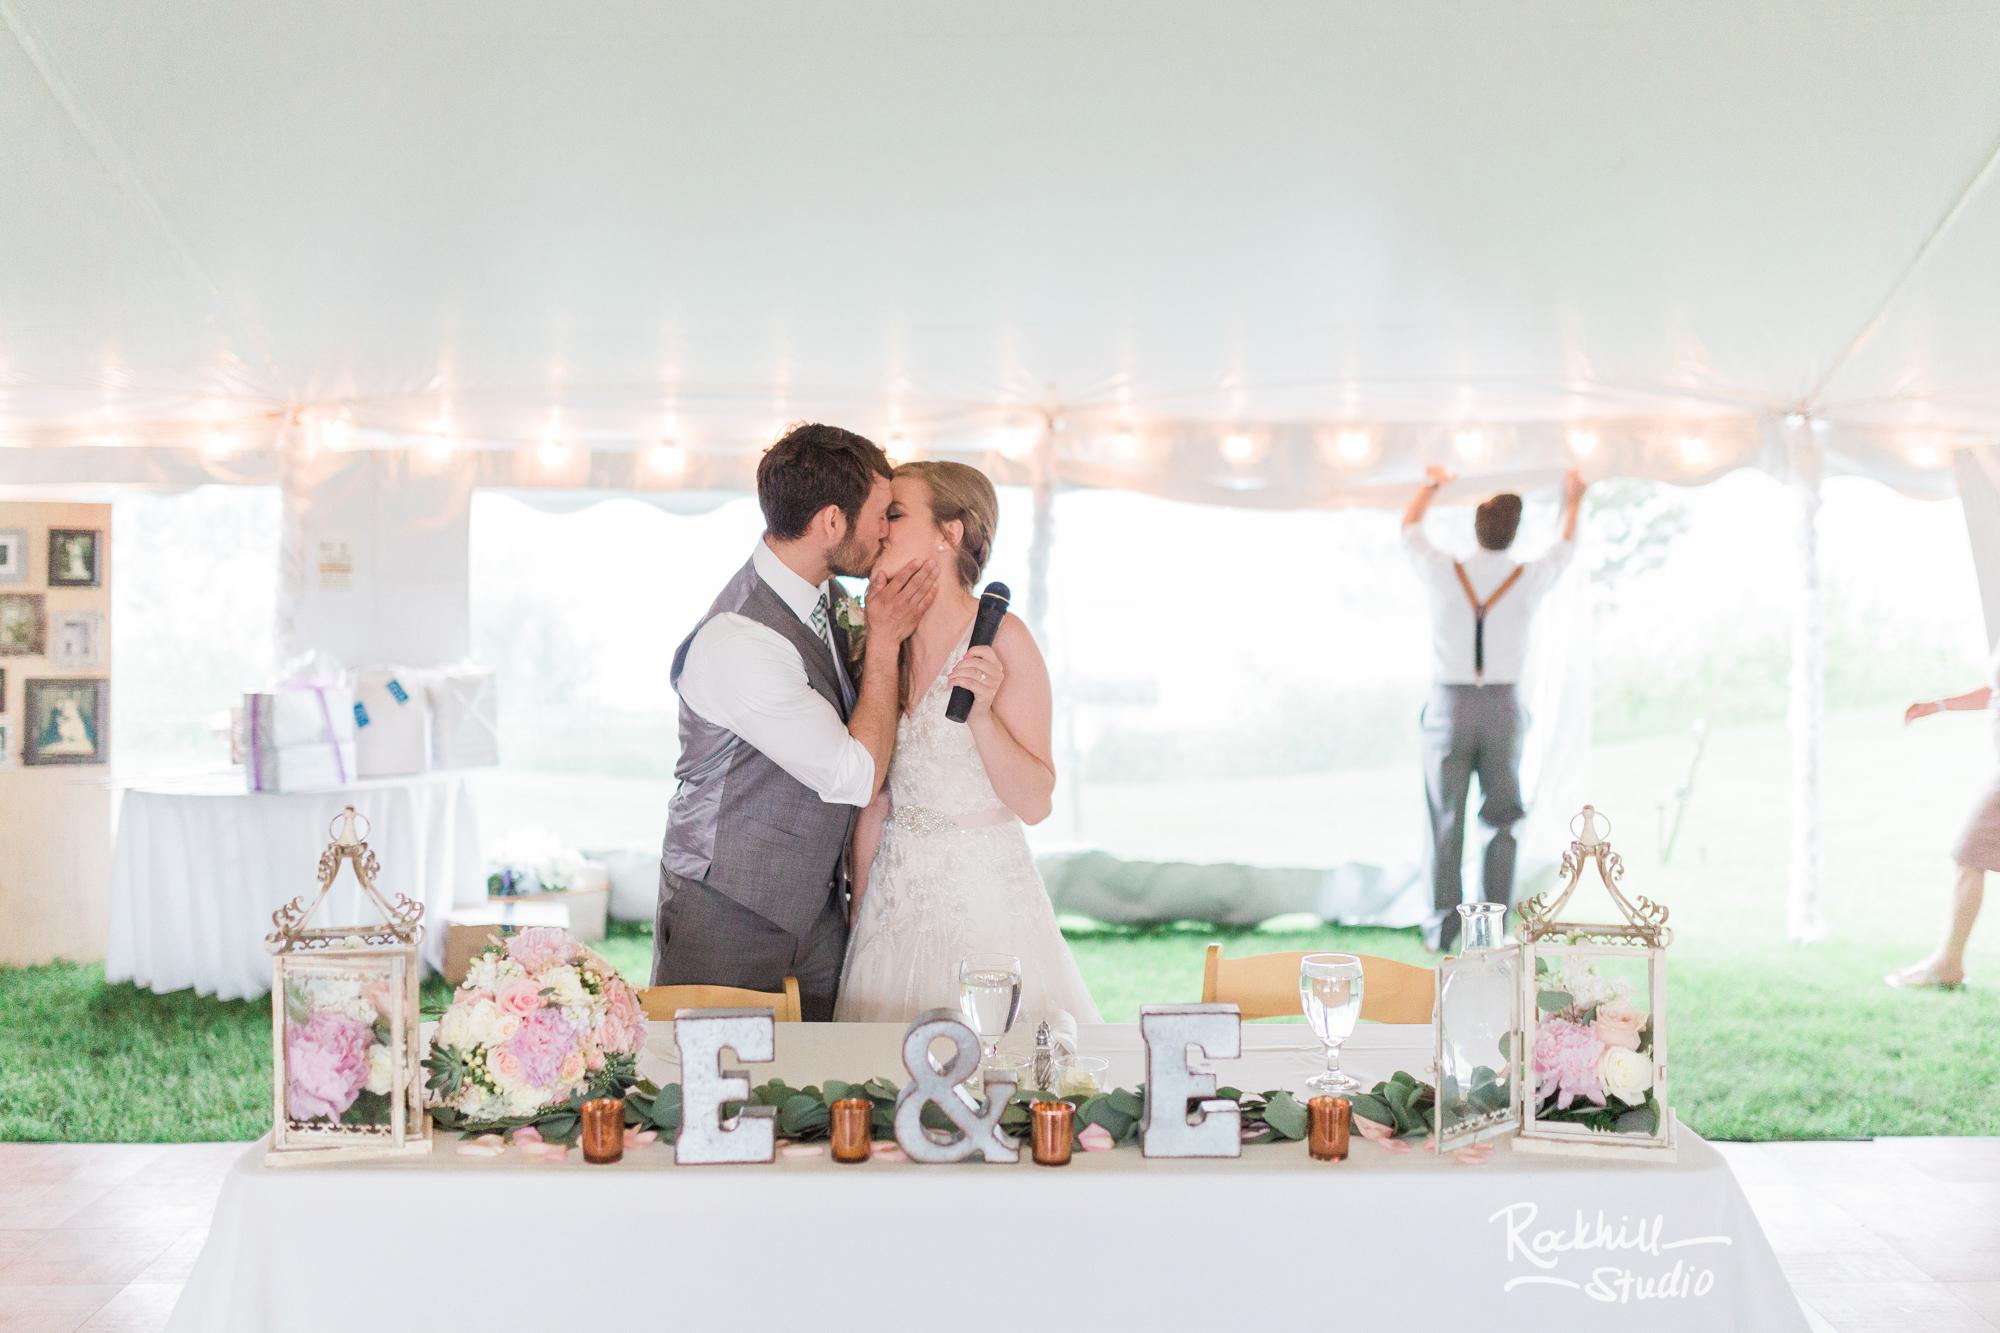 marquette-michigan-wedding-upper-peninsula-spring-photography-rockhill-ee-62.jpg